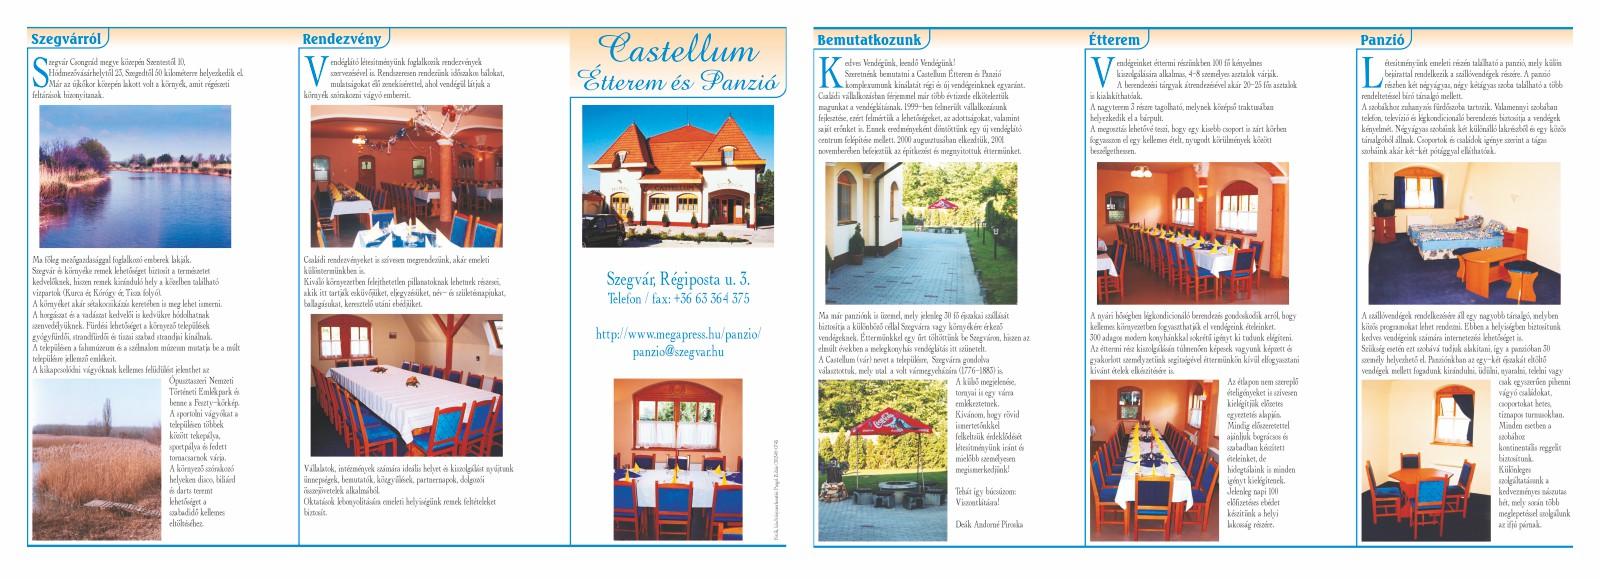 008-CastellumEtteremEsPanzioSzorolap-2003